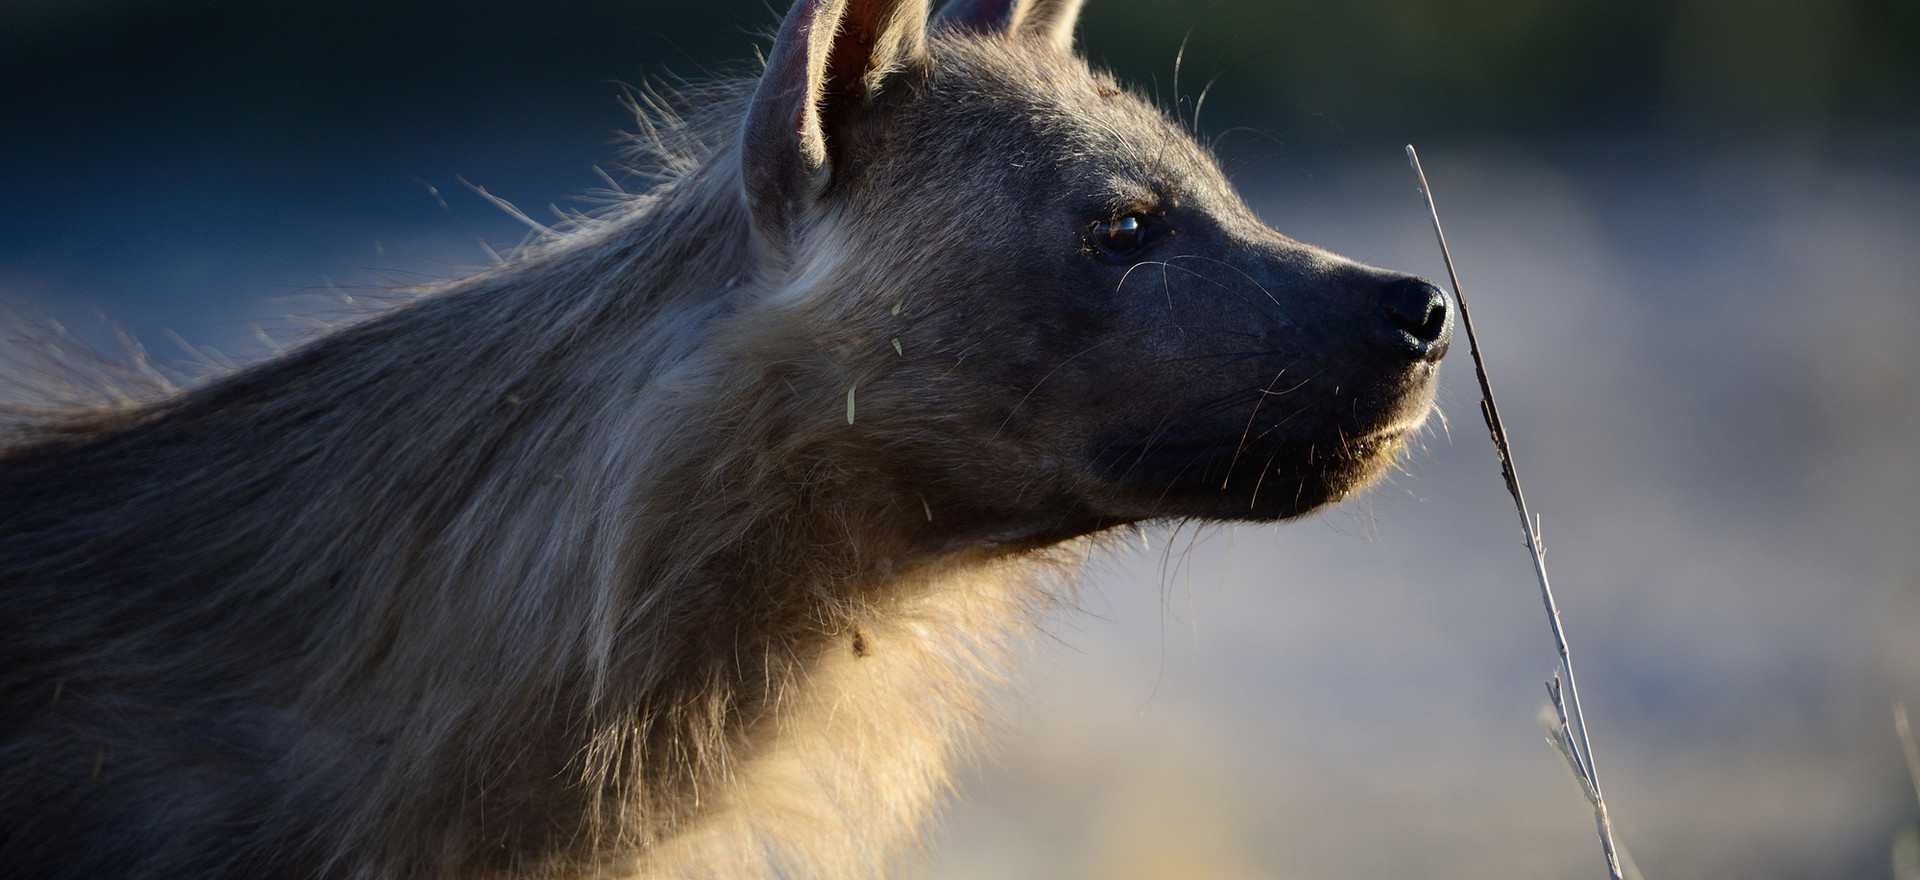 Braune Hyäne, Kgalagadi TFNP, Botswana